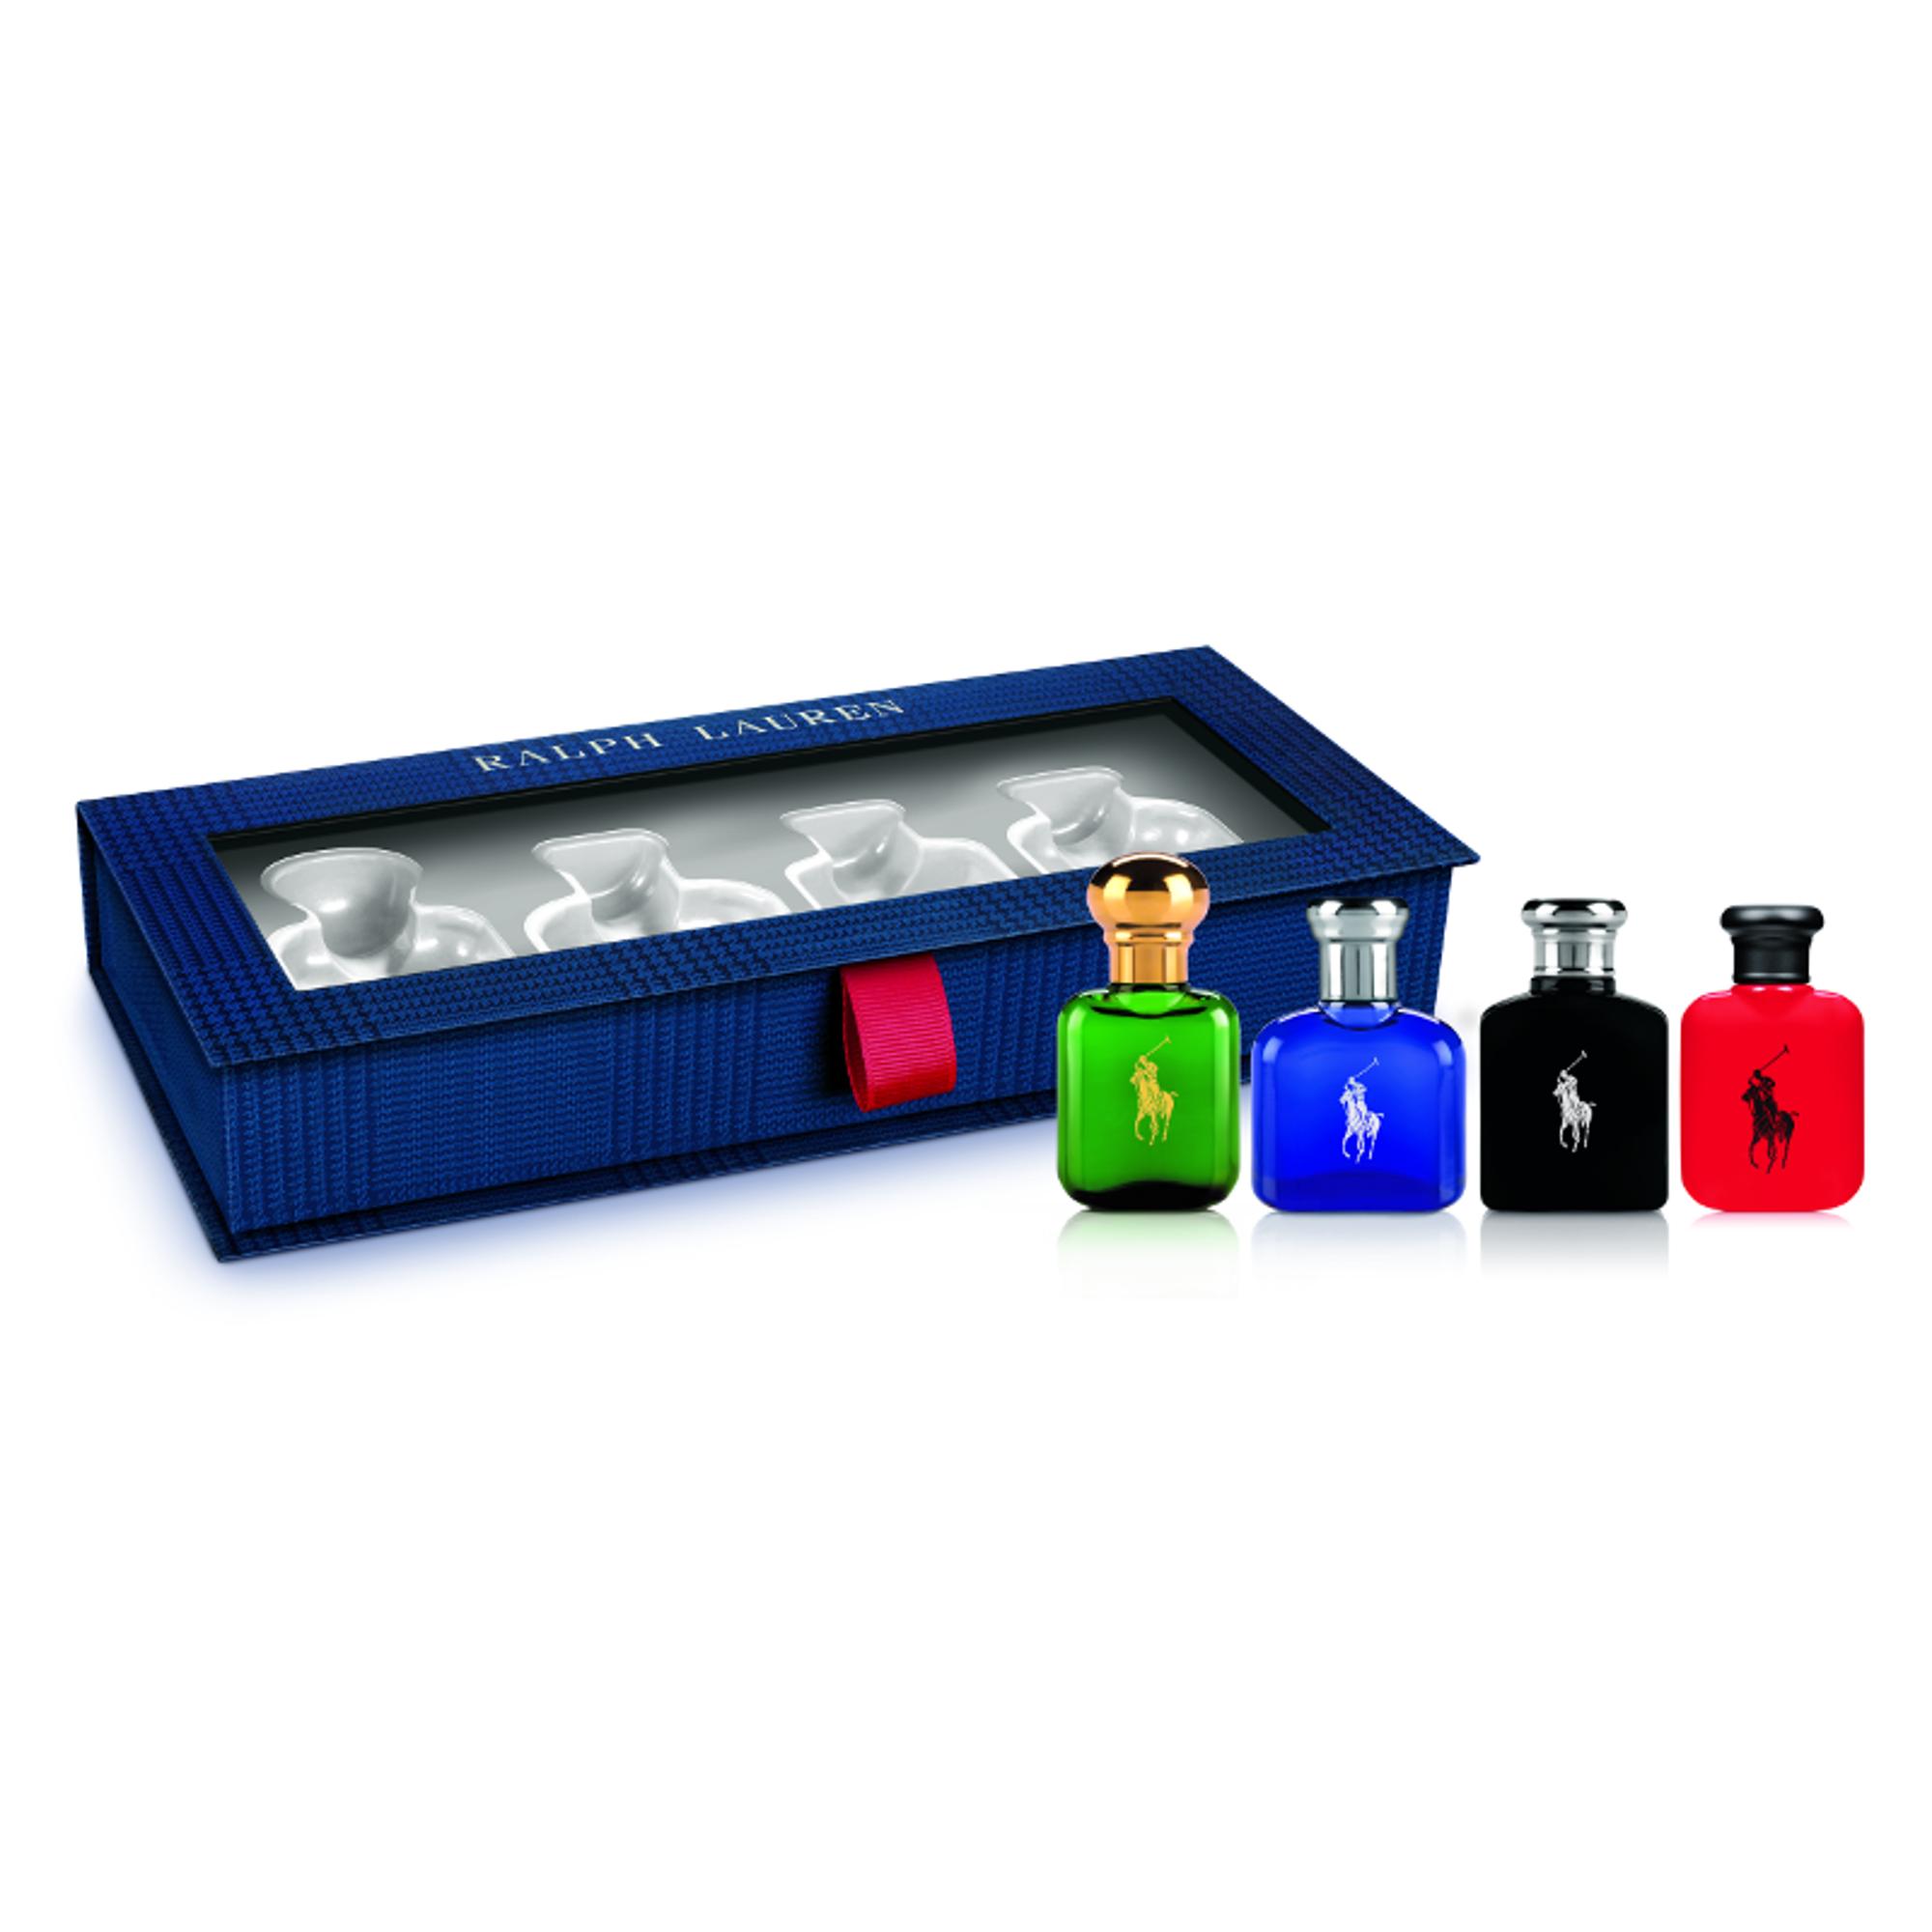 World Of Polo Gift Set Polo EdT 15ml+Polo Red edT 15ml+Polo Blue EdT 15ml+Polo Black EdT 15ml